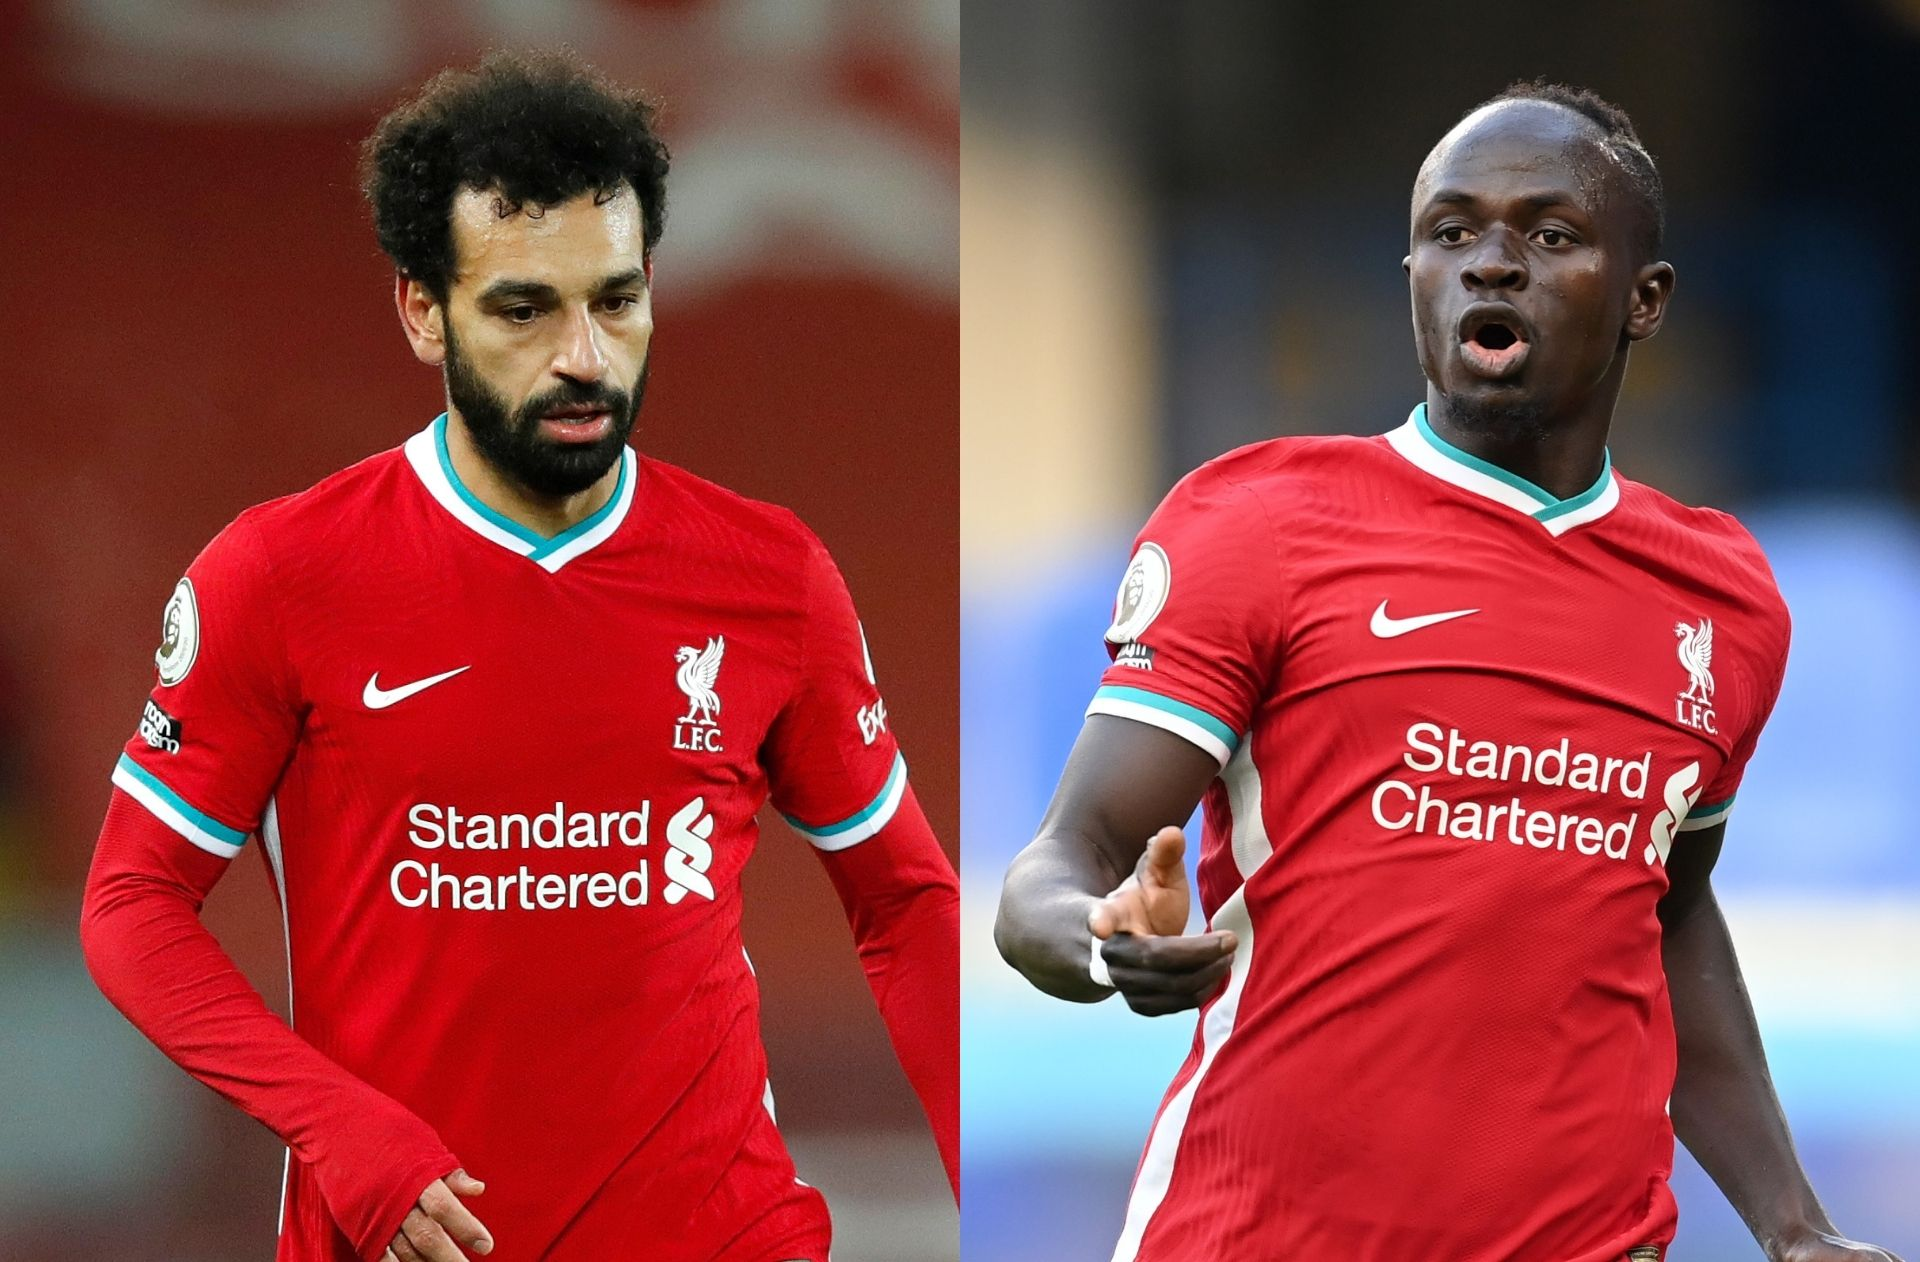 Mohamed Salah & Sadio Mane - Liverpool